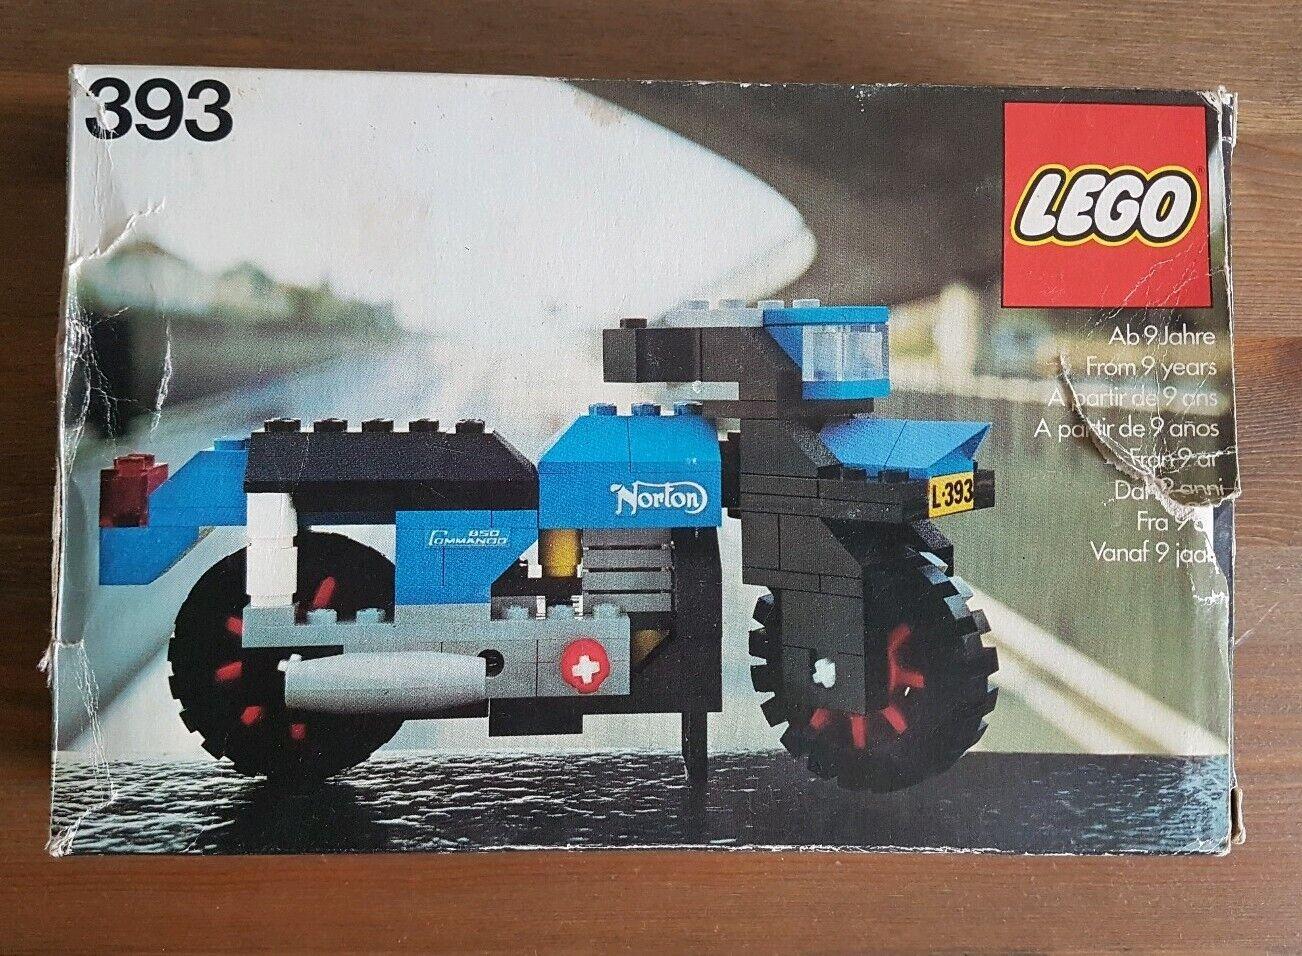 Lego 393 Norton Commando nouveau dans neuf dans sa boîte scellée 1976 Moto RARE investissement